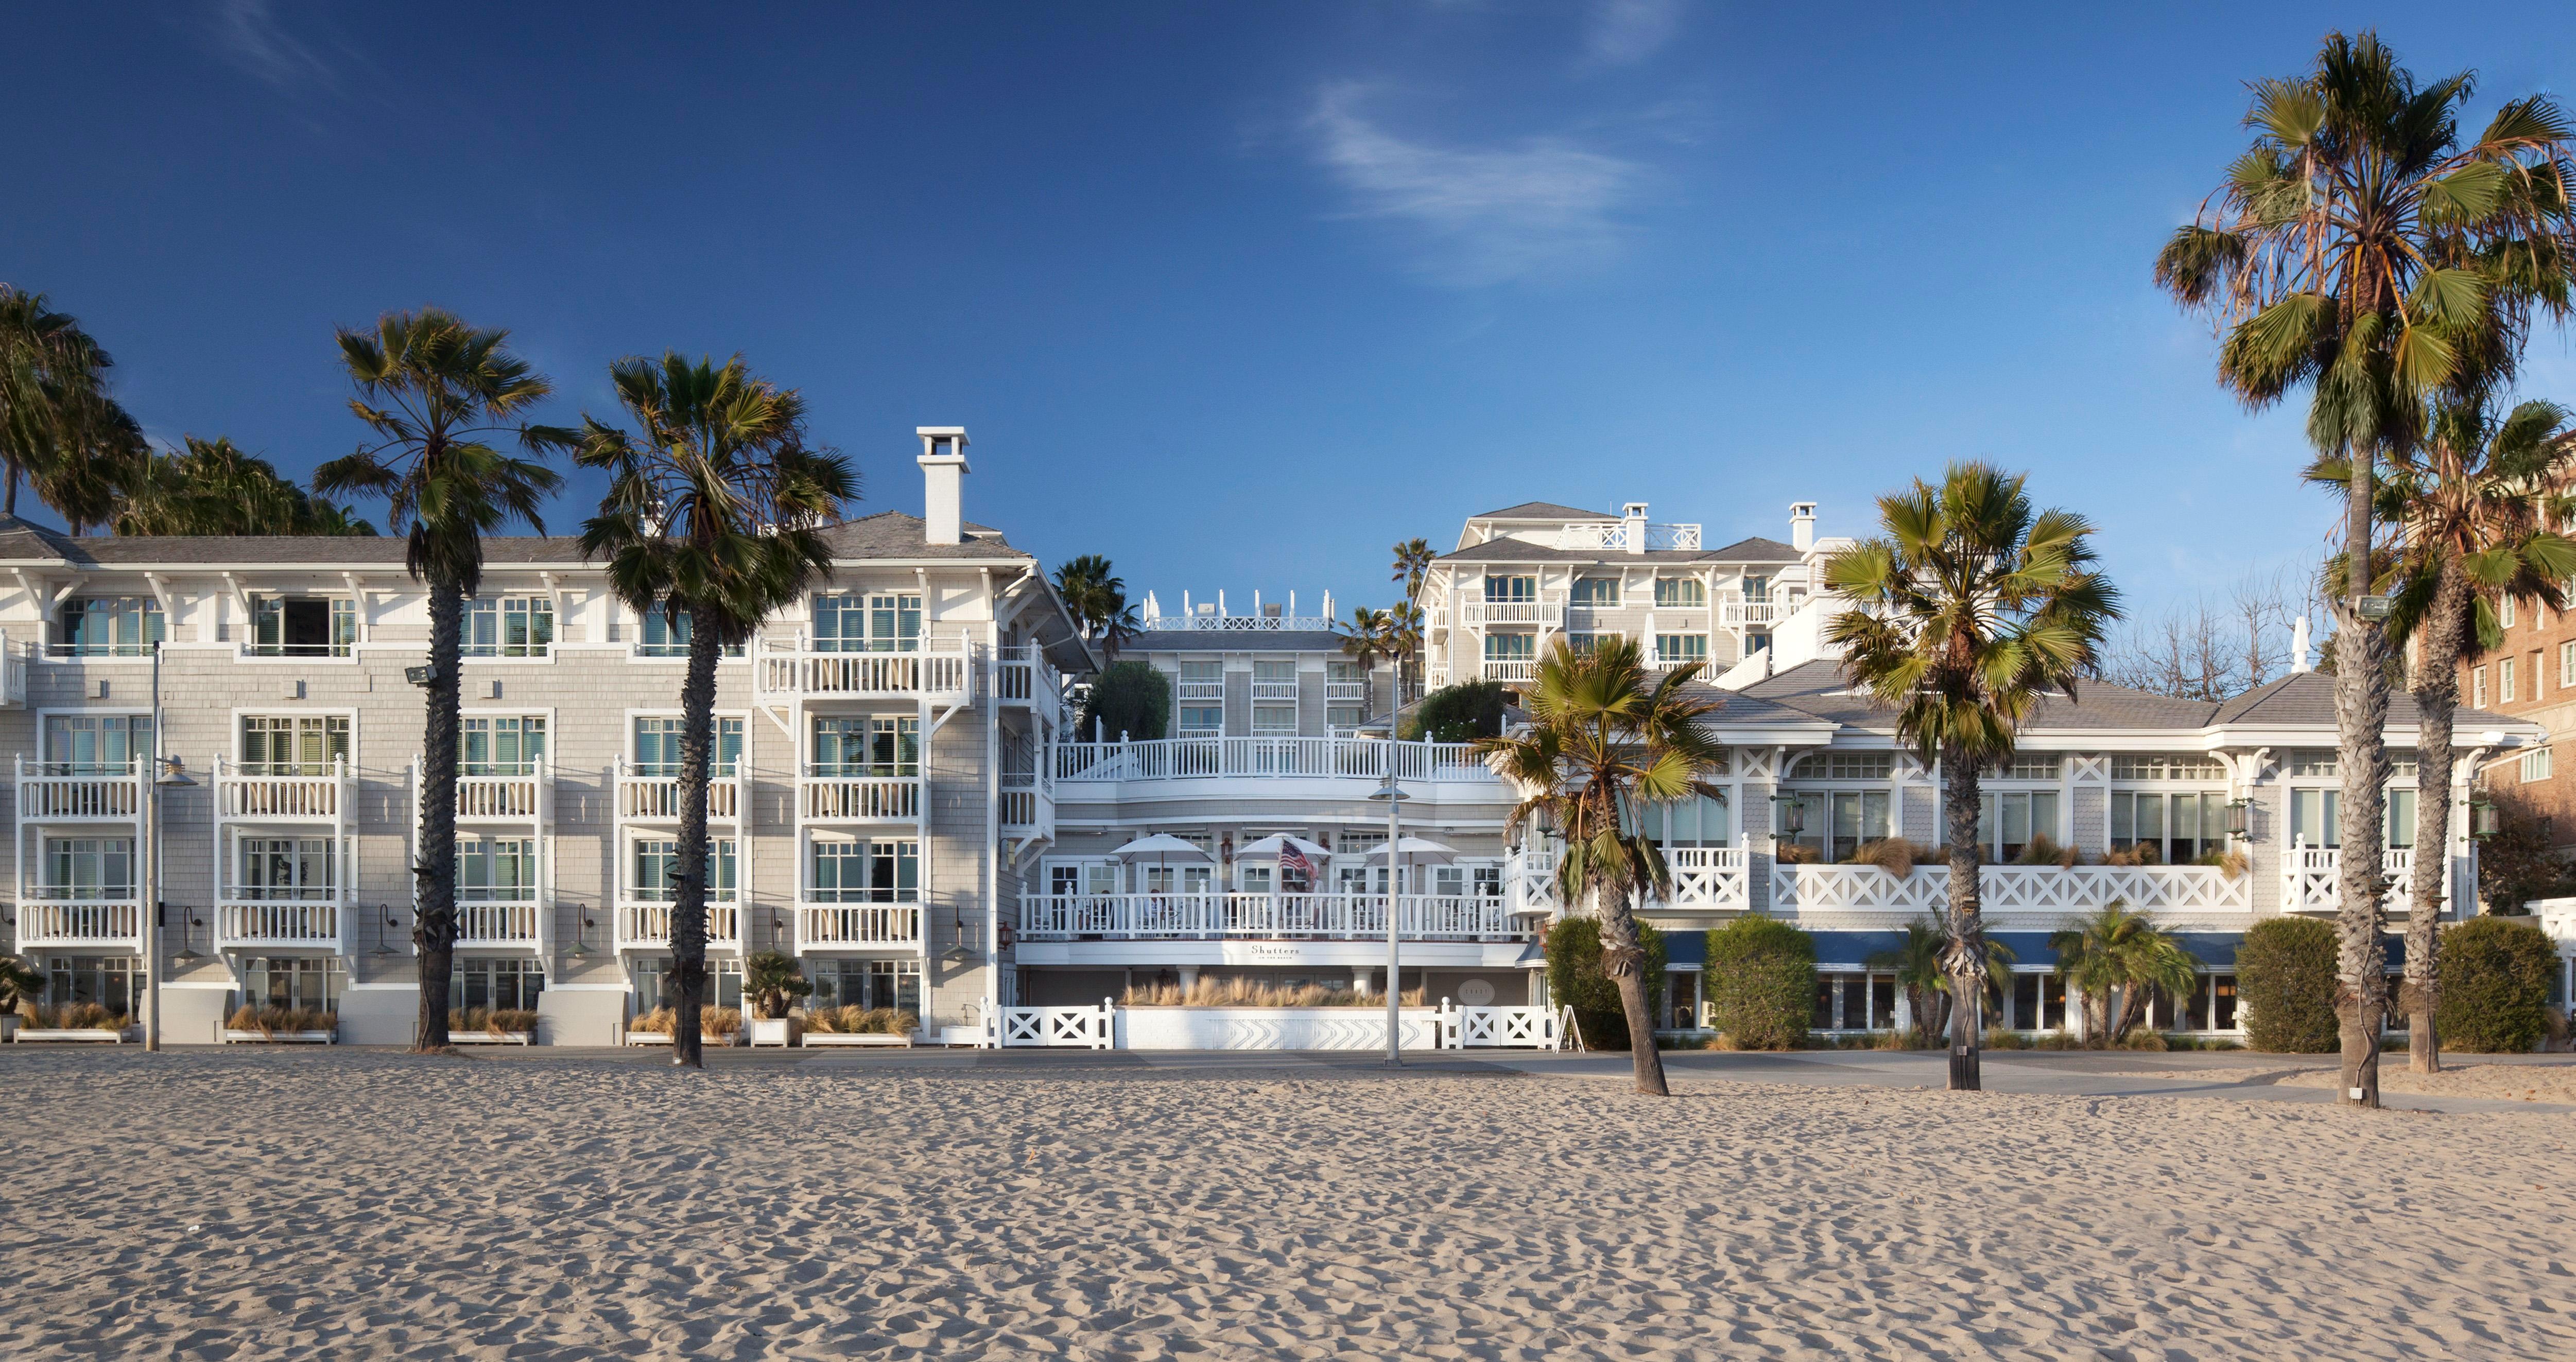 city meets beach hotel shutters on the beach palm trees